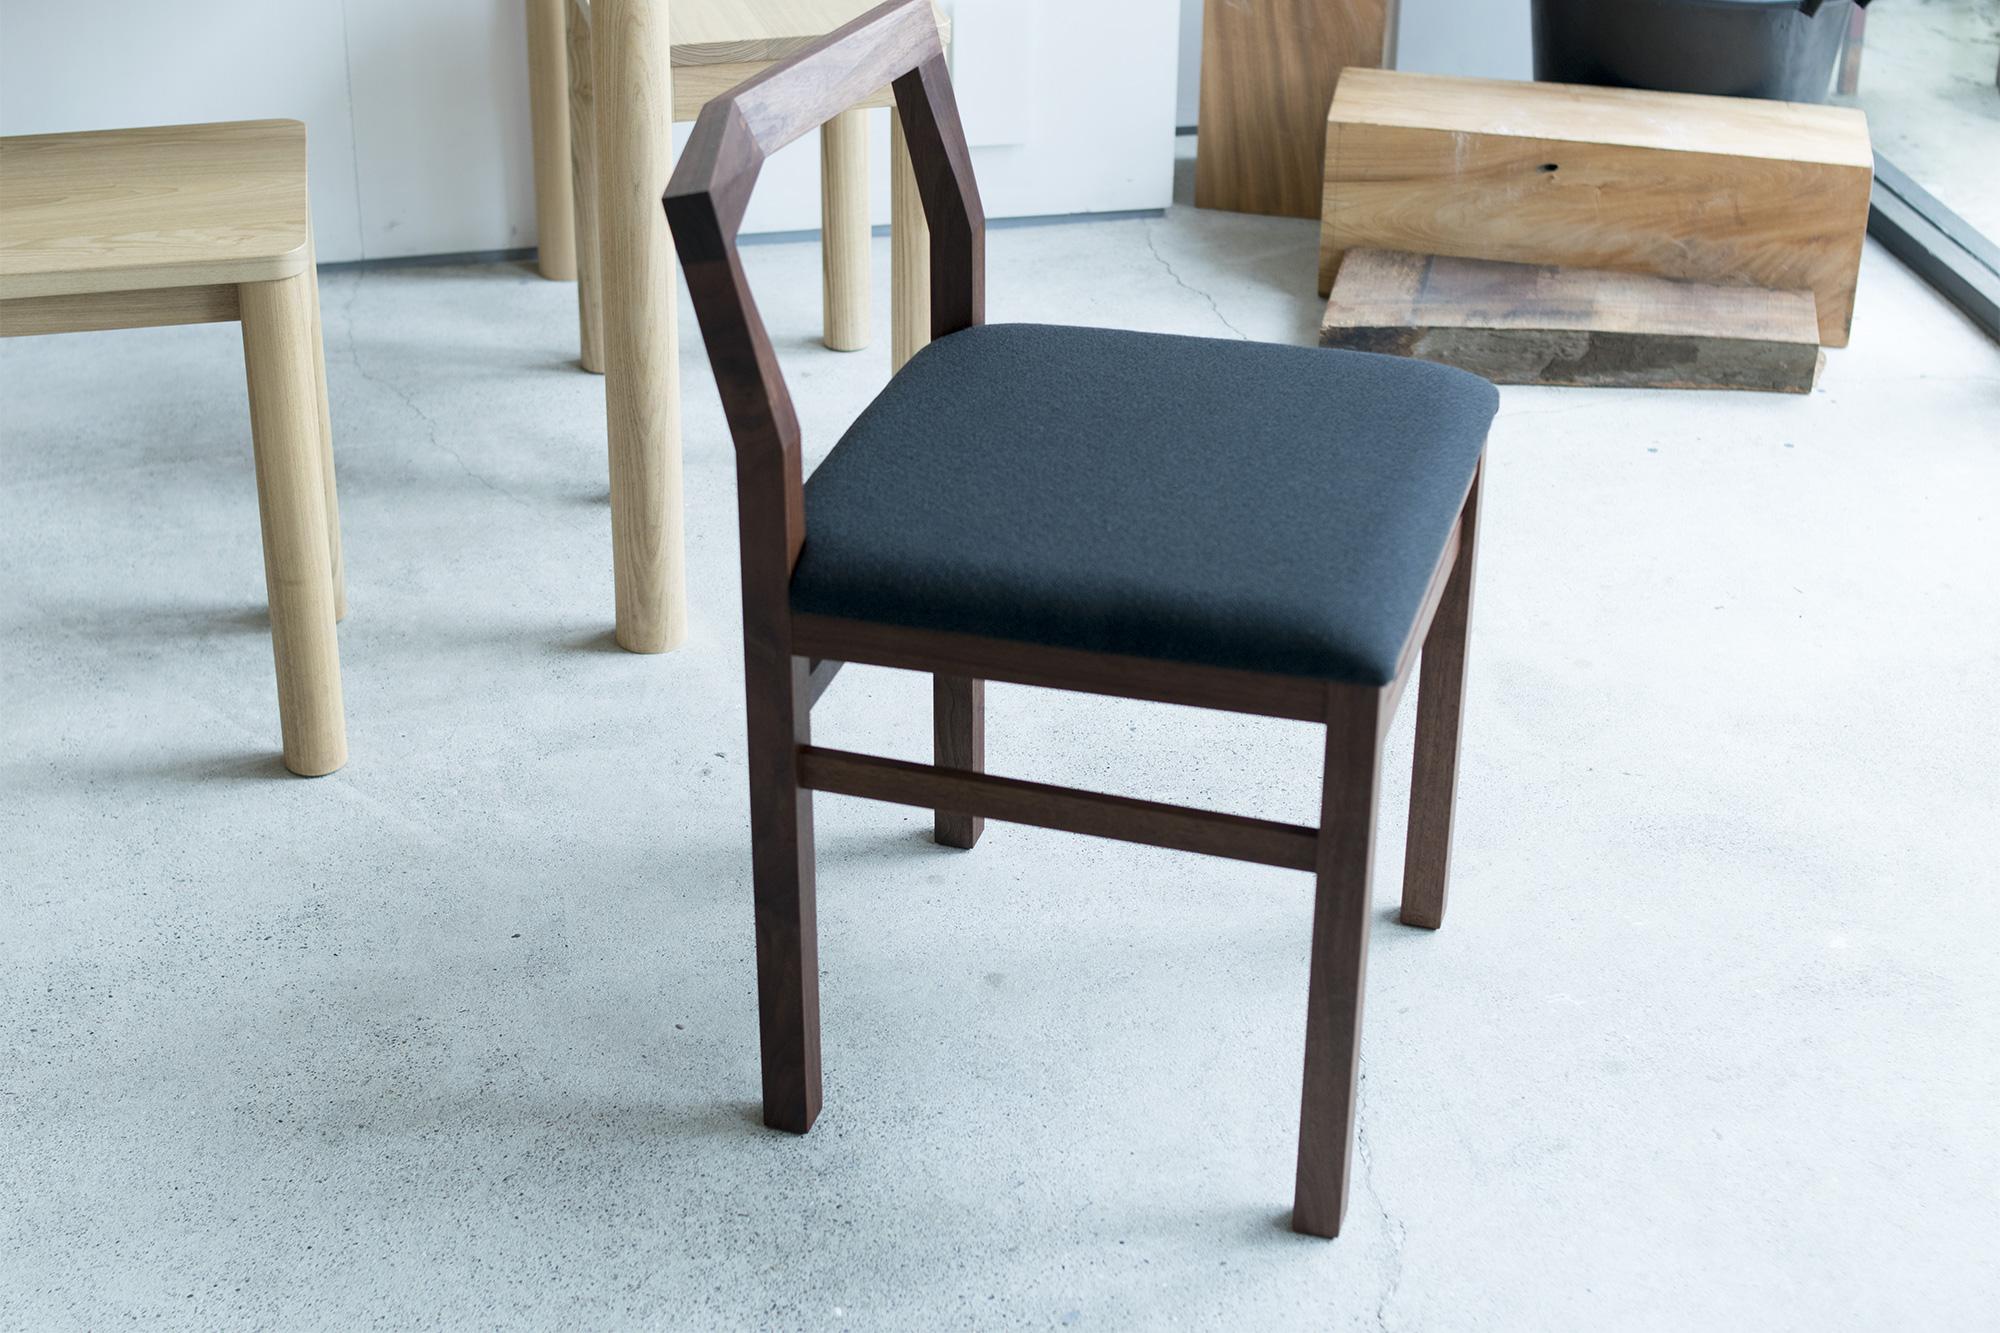 PICO chair ピコチェア ウォールナット材+グレー